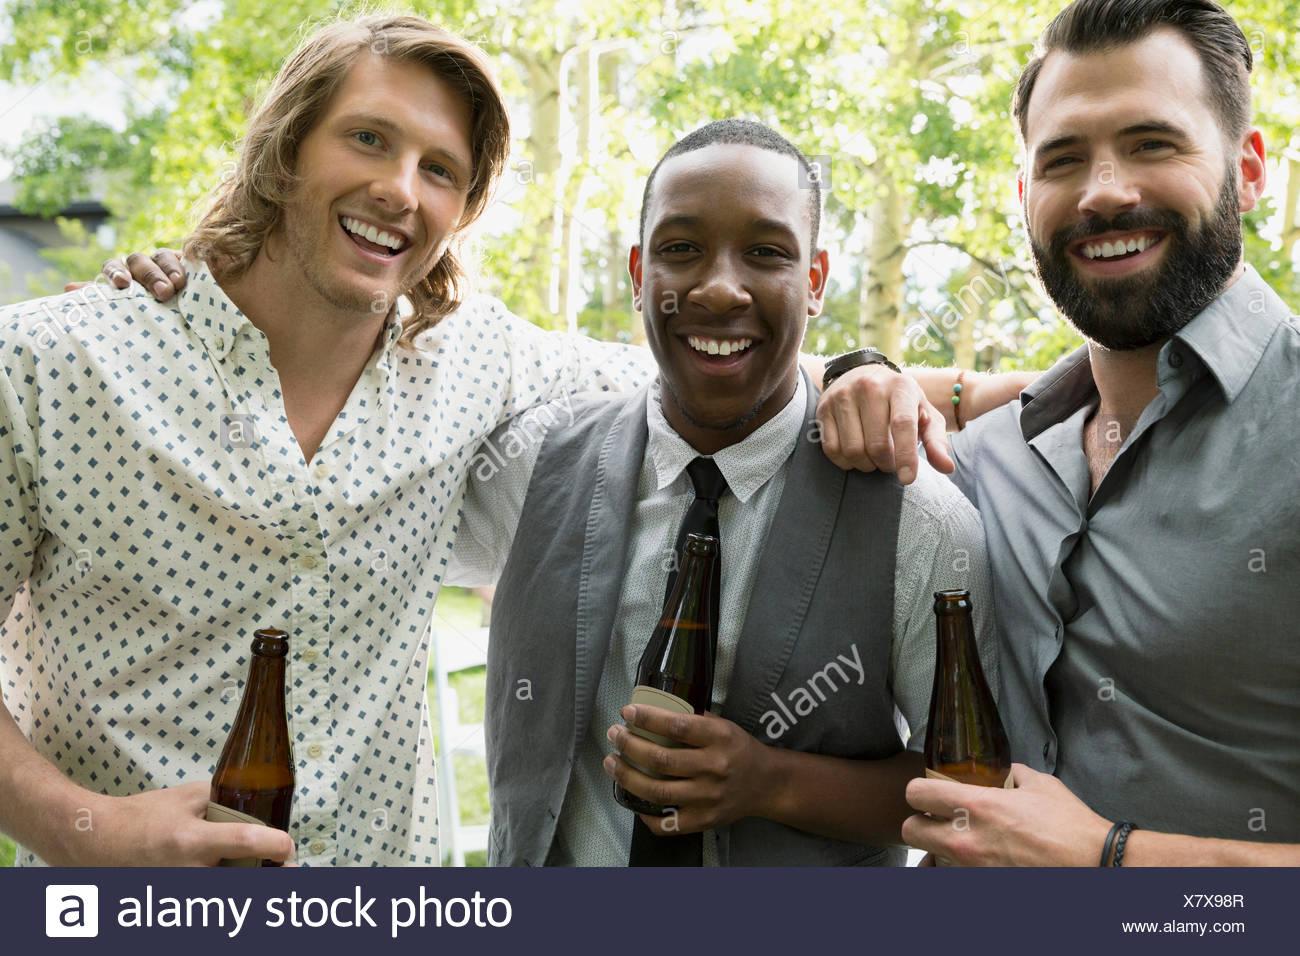 Portrait smiling men drinking beer - Stock Image